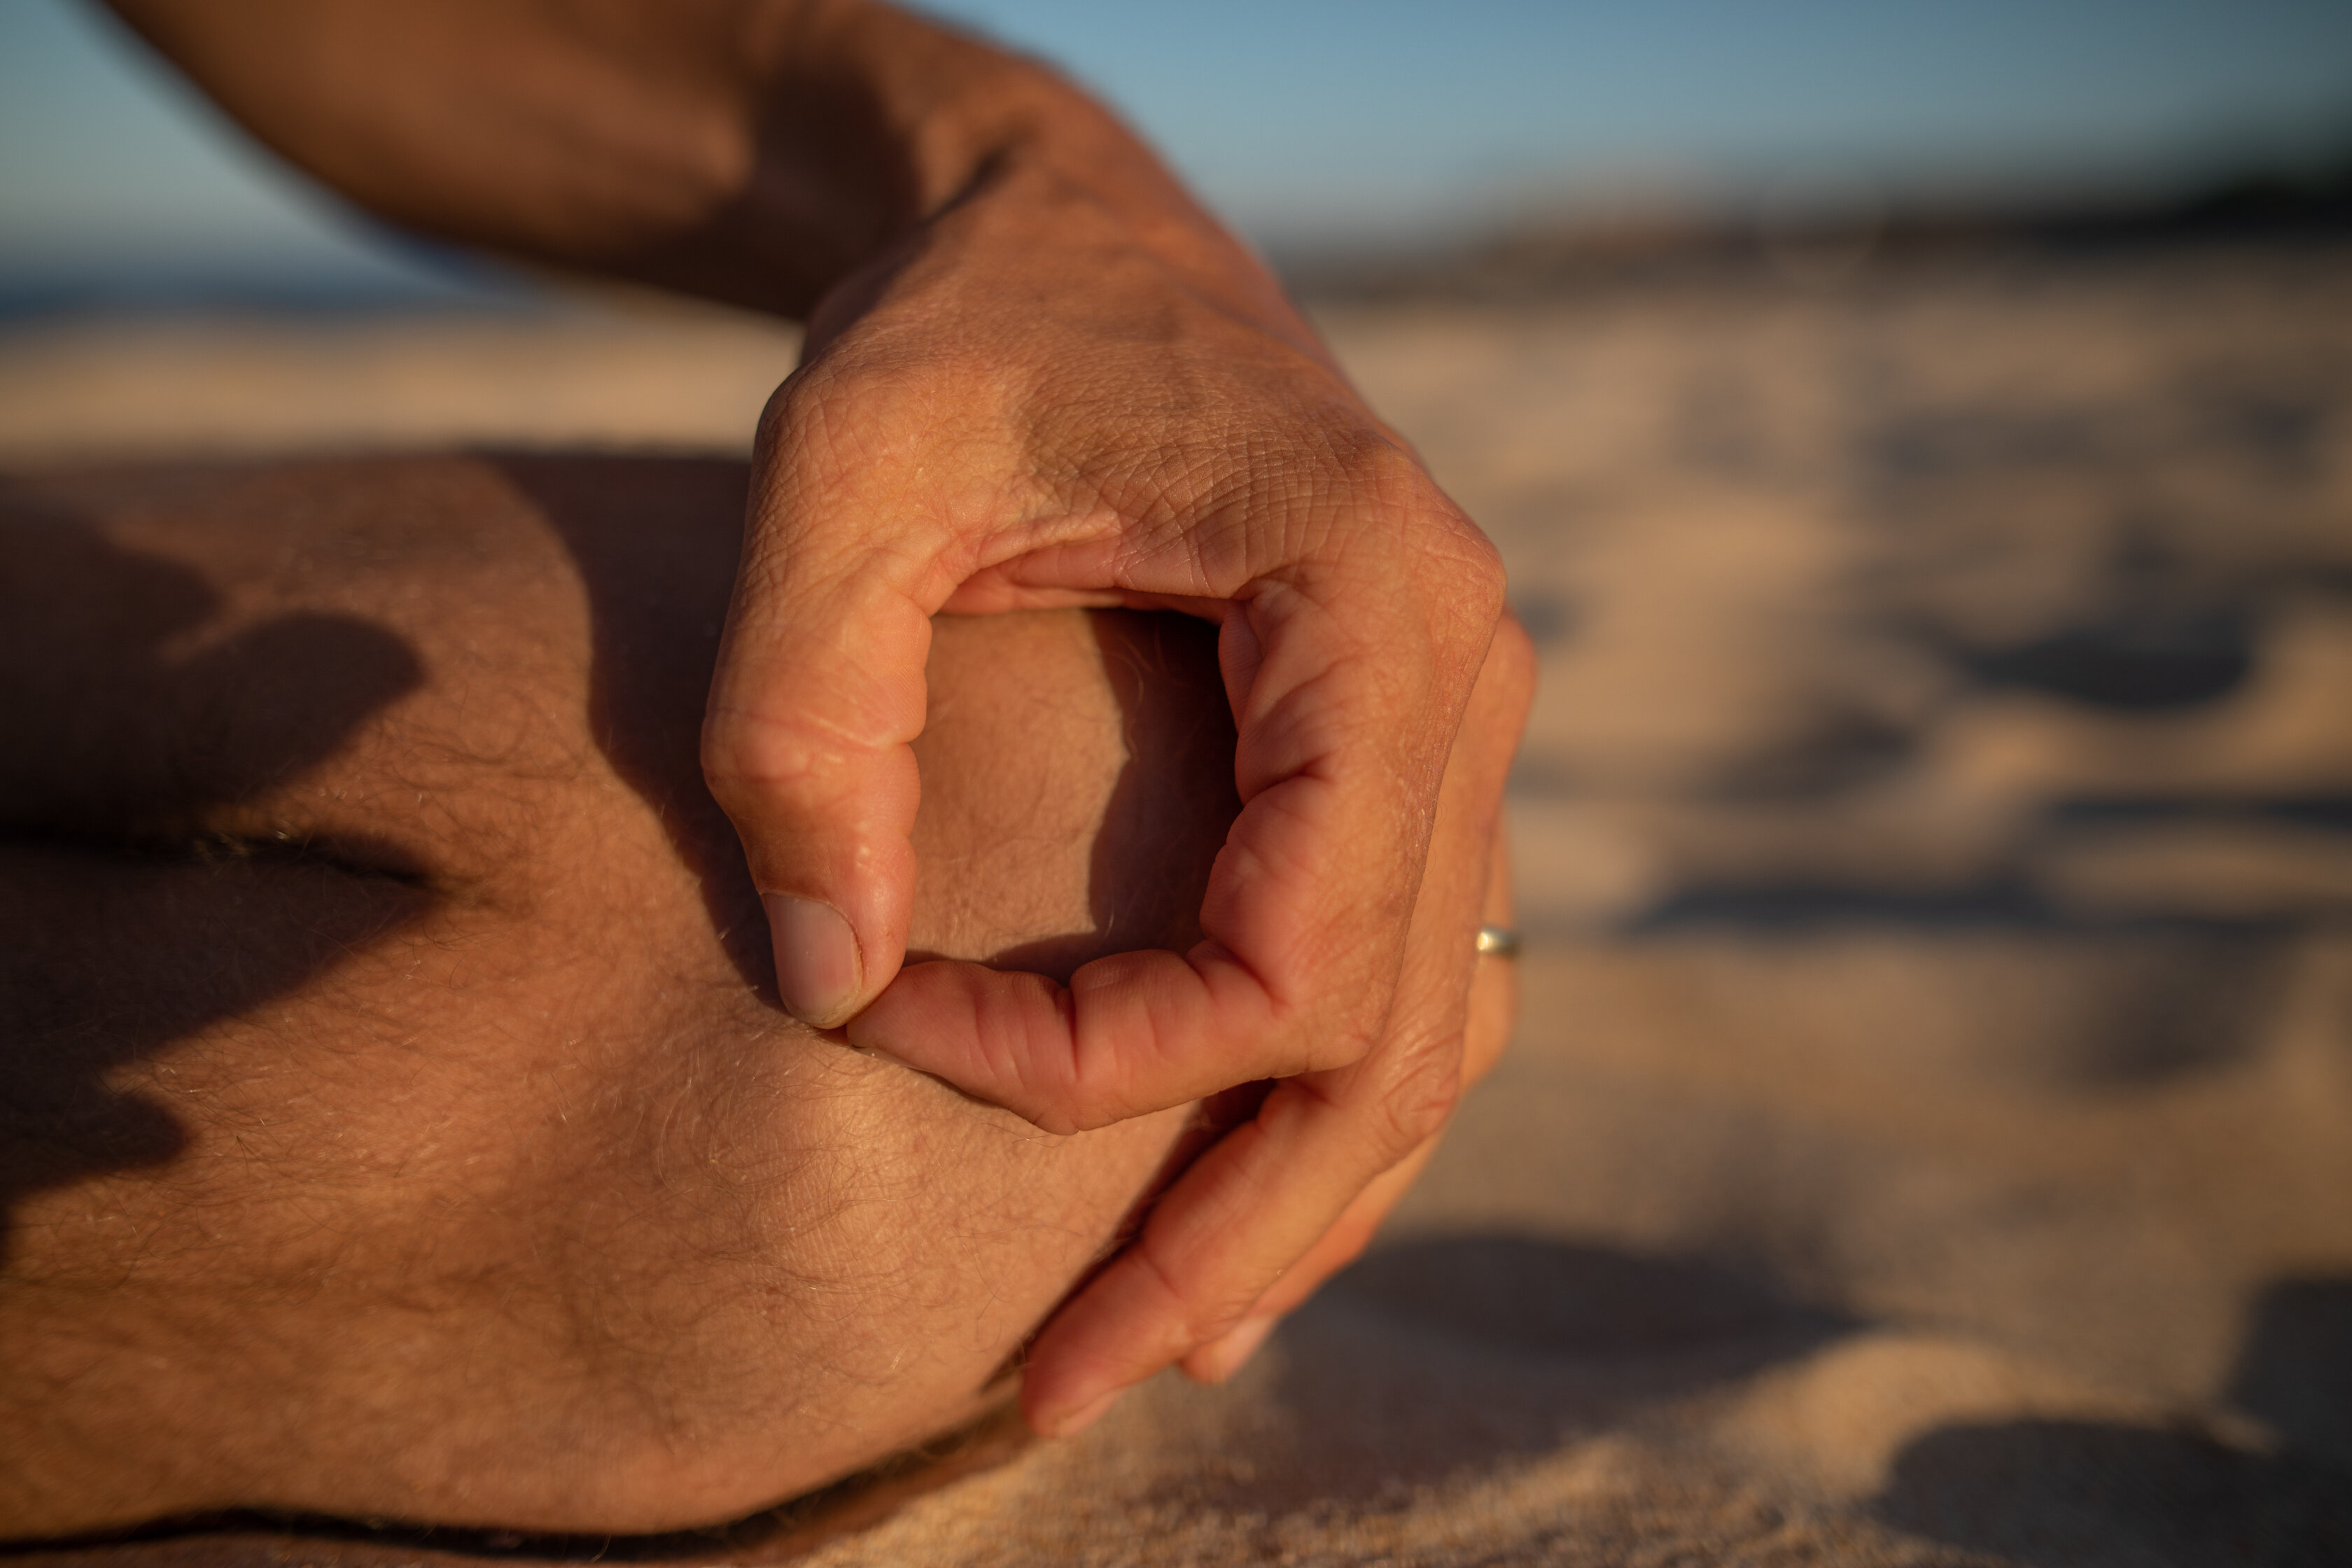 michael meditation mind training mindfulness mudra